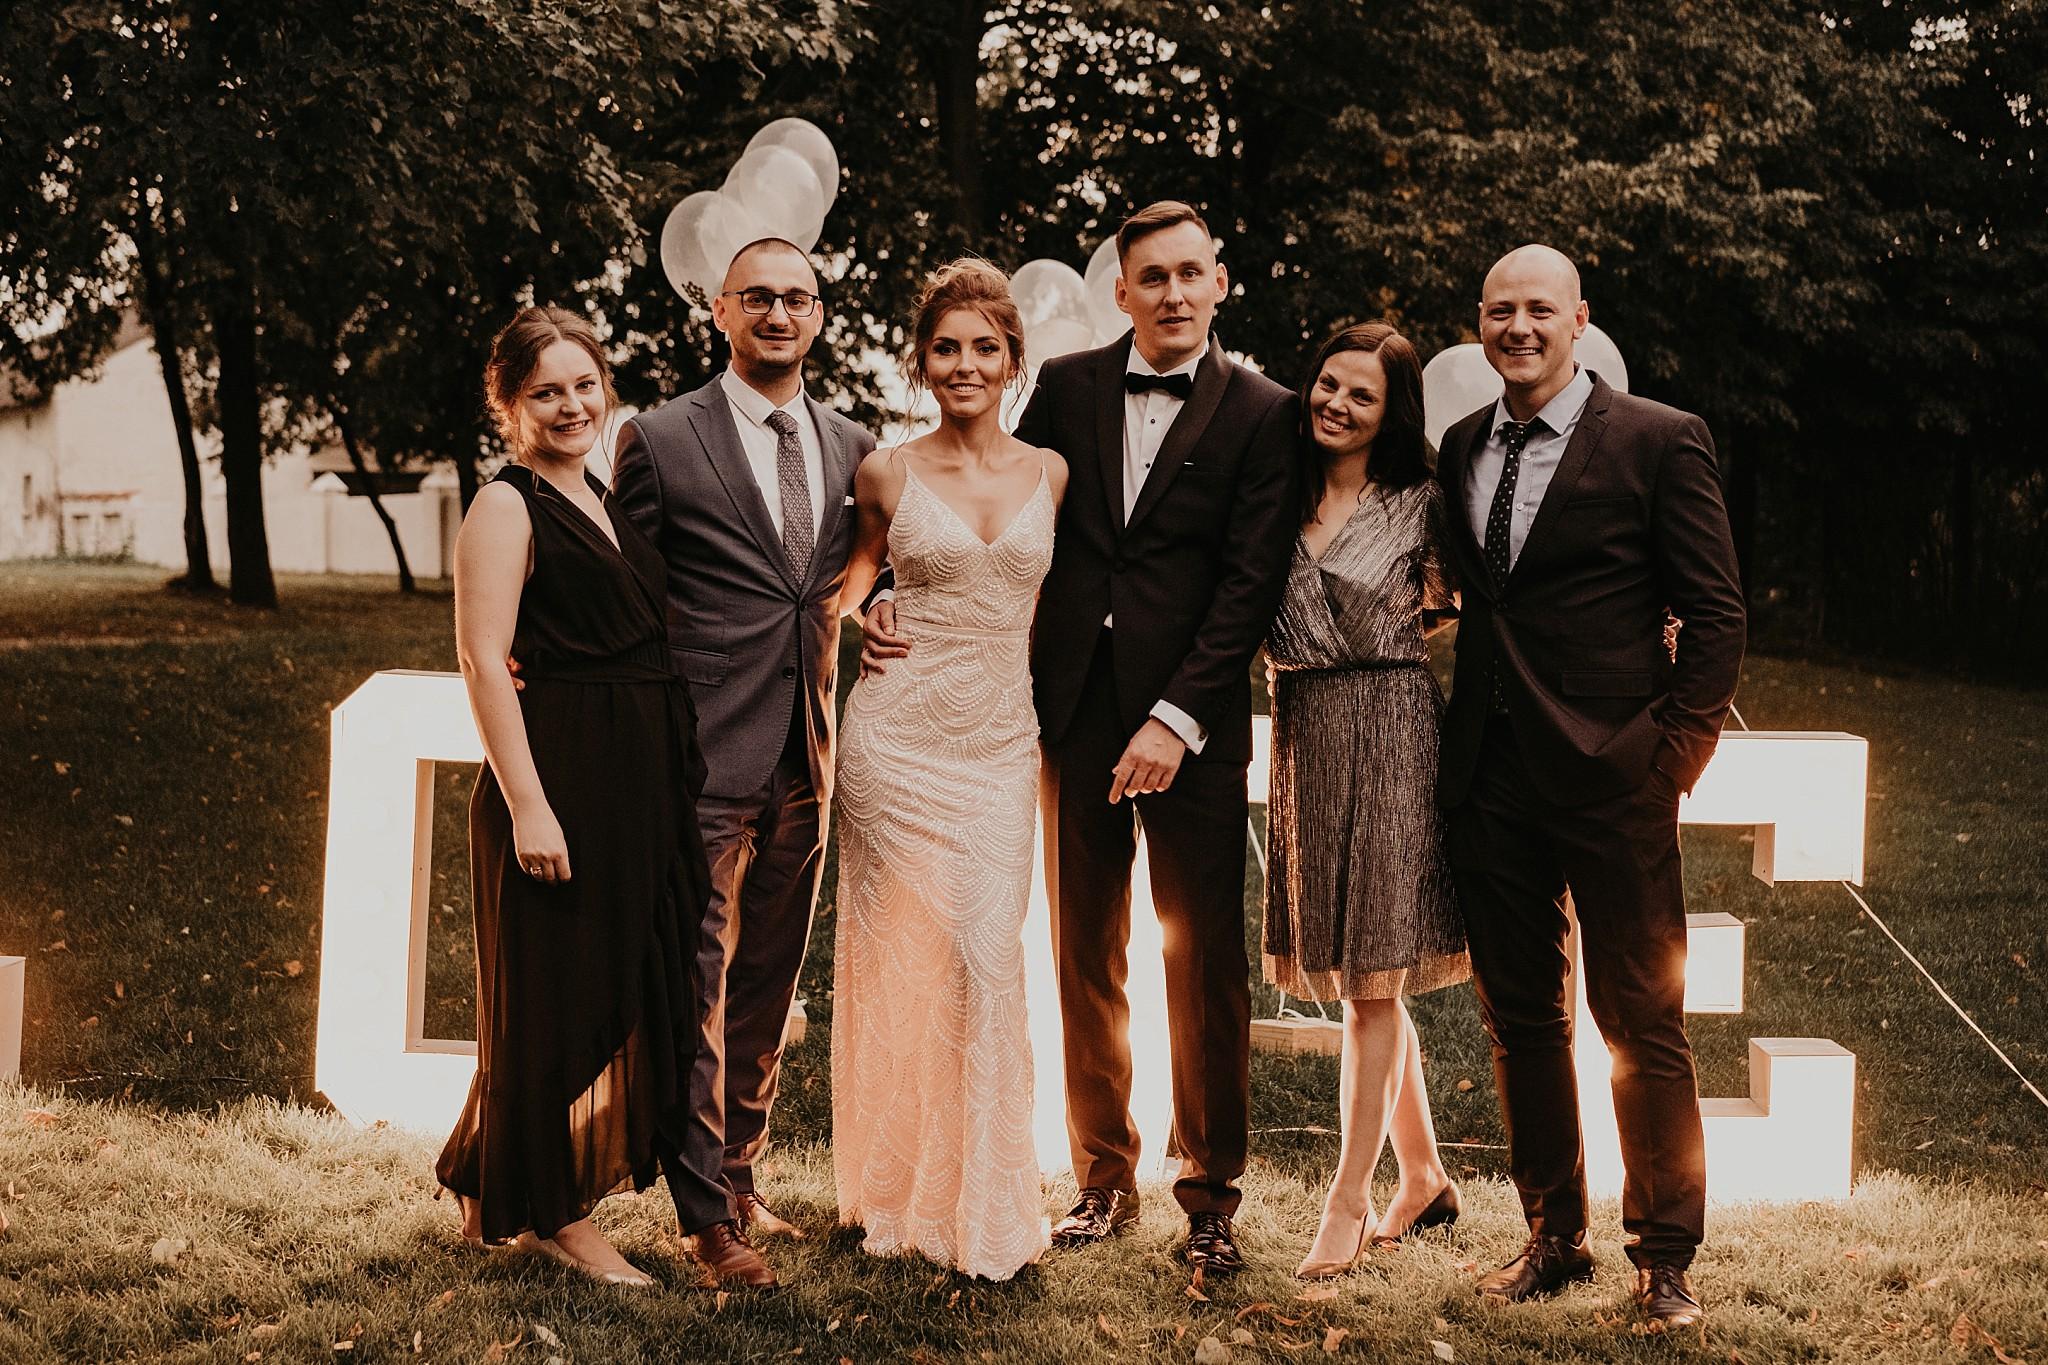 fotograf poznan wesele dobra truskawka piekne wesele pod poznaniem wesele w dobrej truskawce piekna para mloda slub marzen slub koronawirus slub listopad wesele koronawirus 337